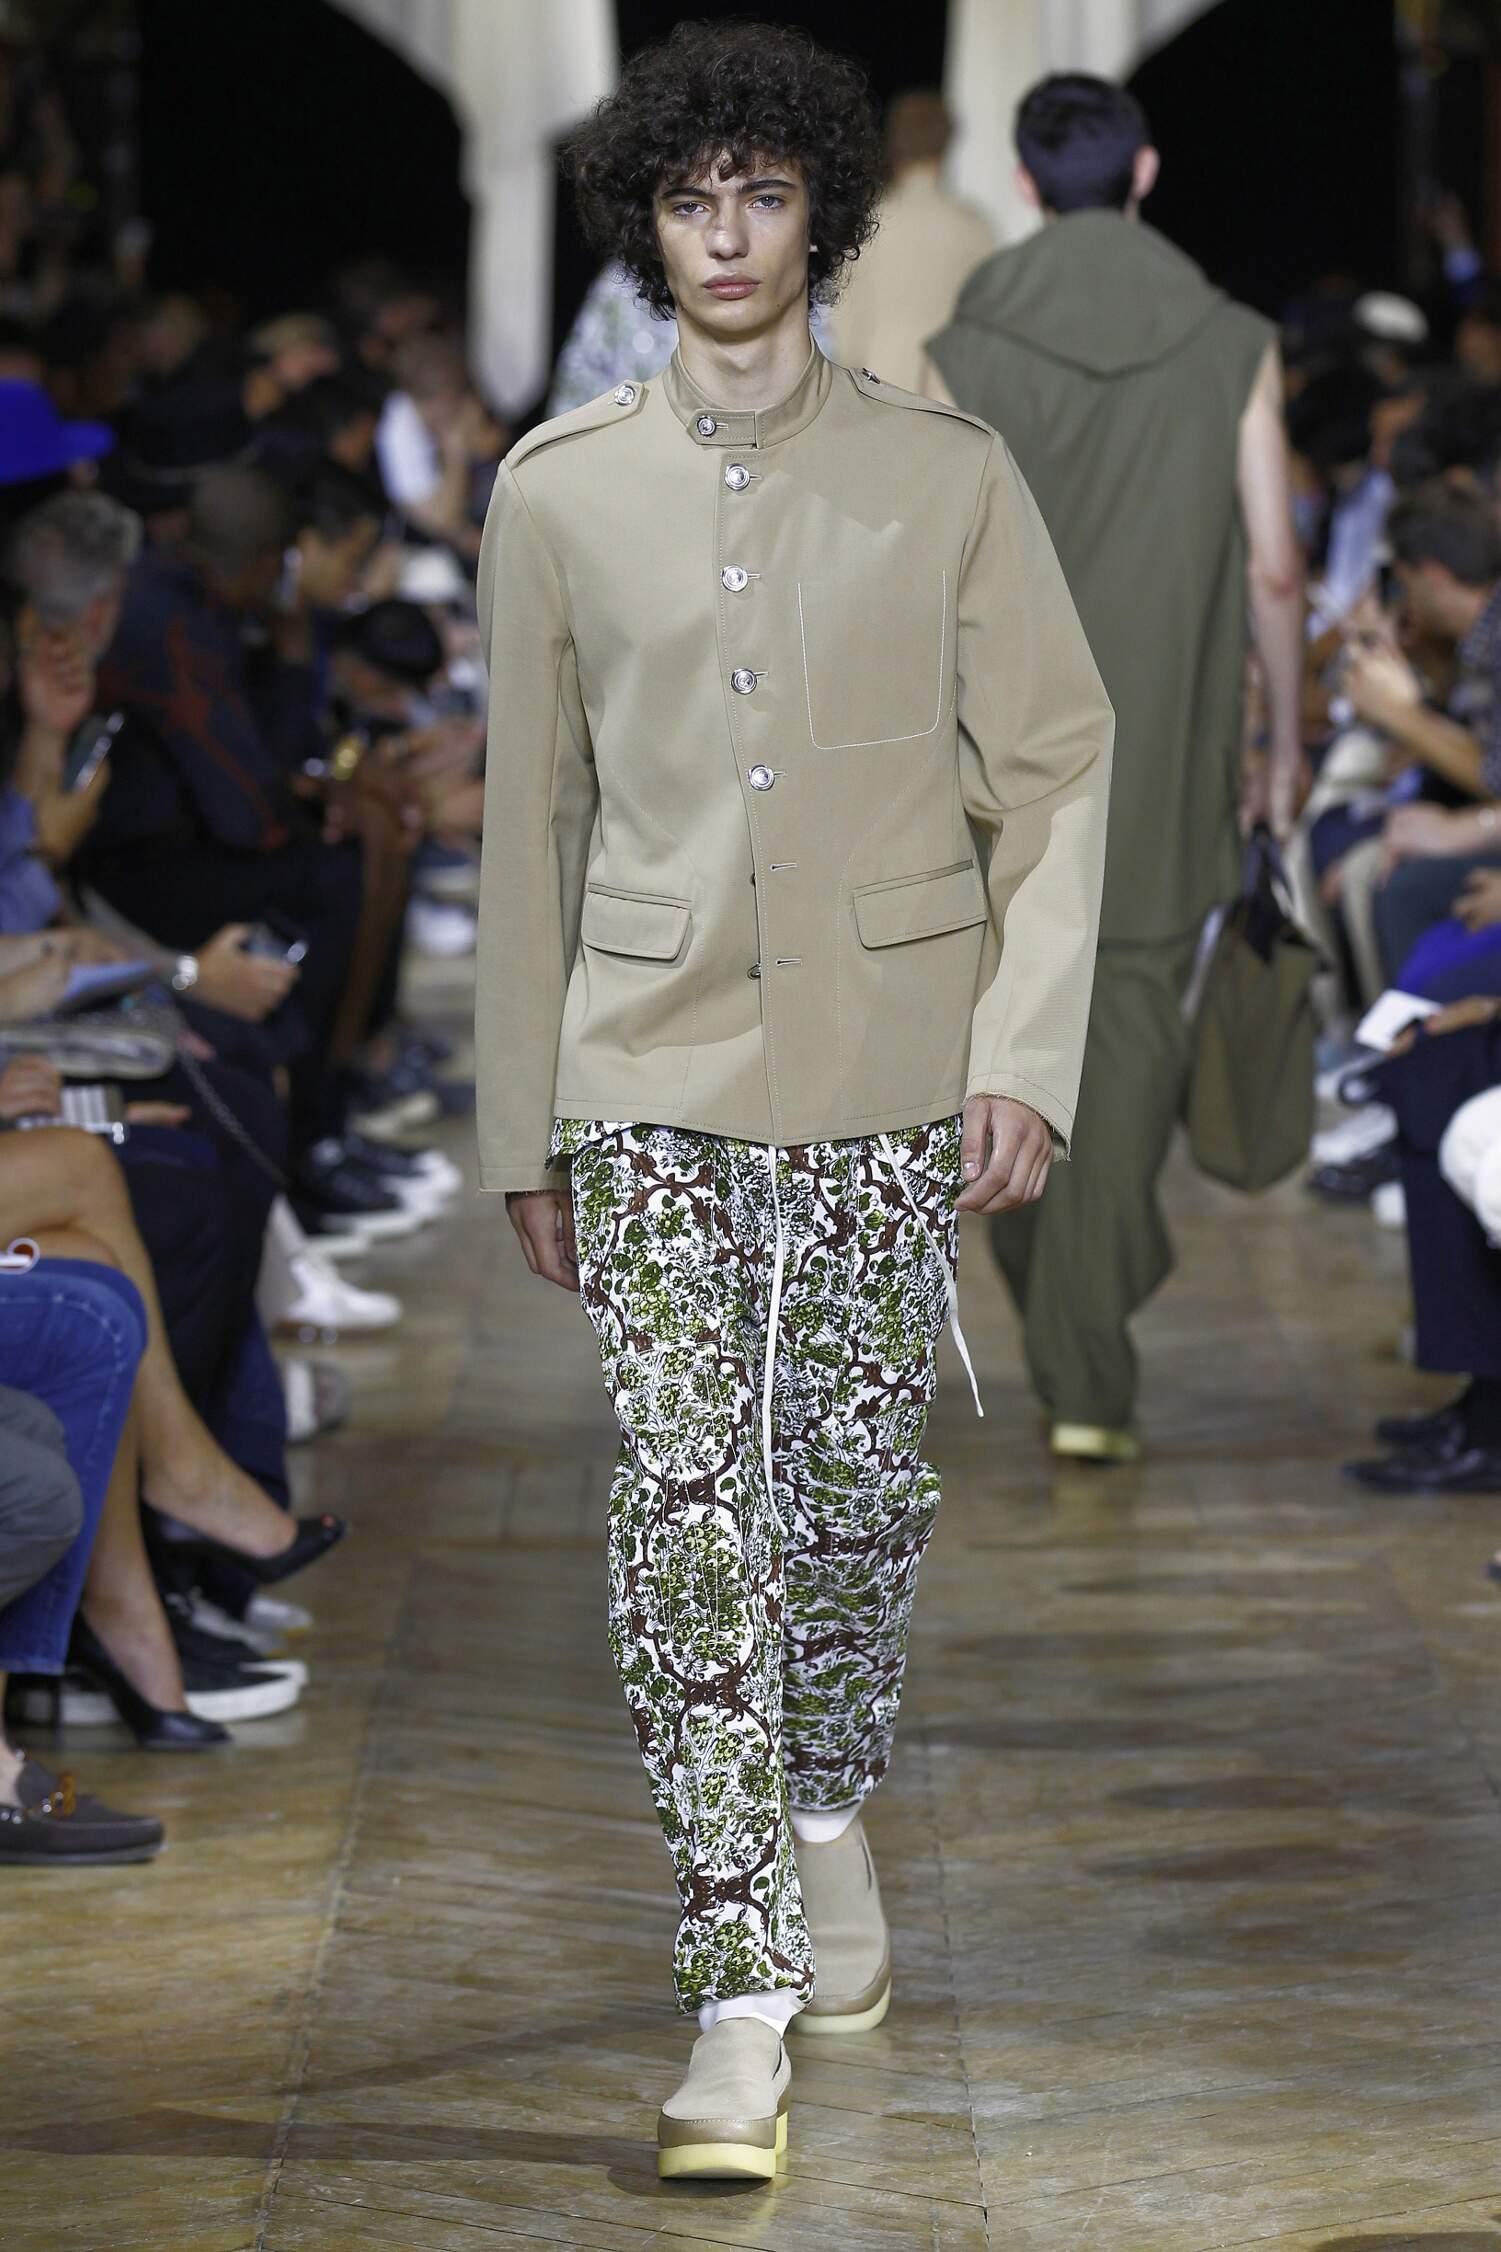 Catwalk Phillip Lim Collection Fashion Show Summer 2016